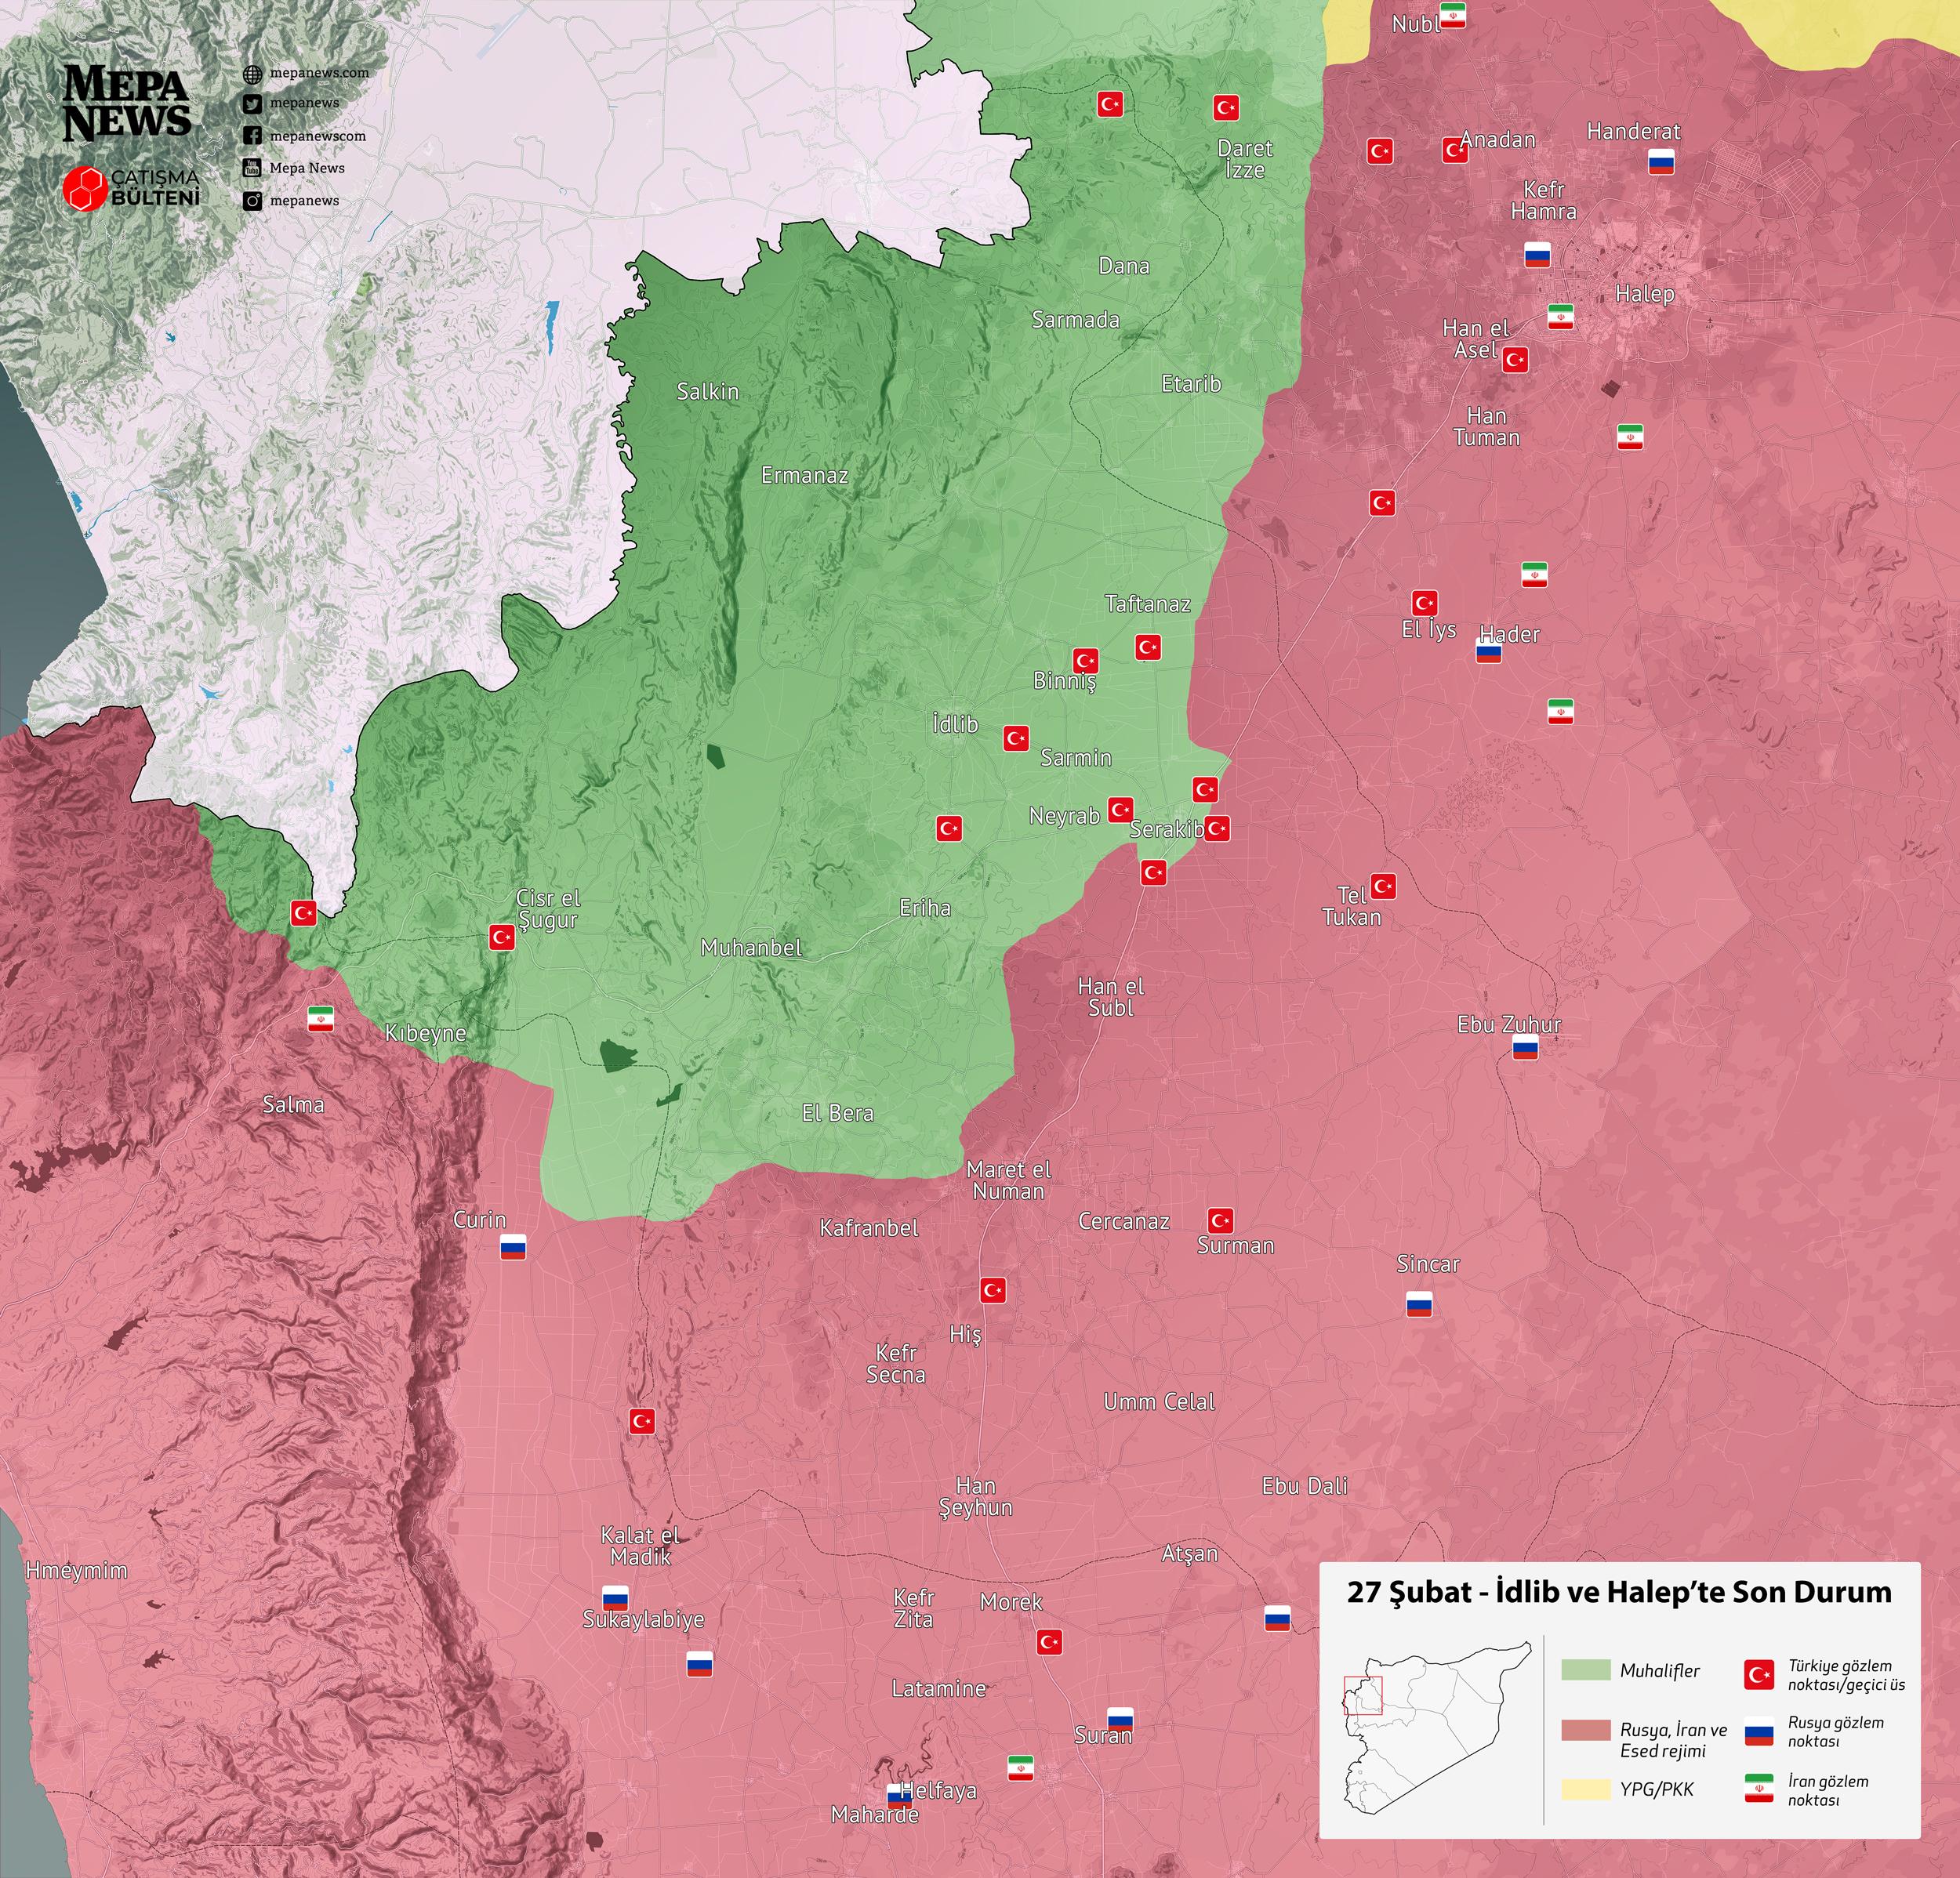 İdlib'de son durum (27 Şubat 2020)